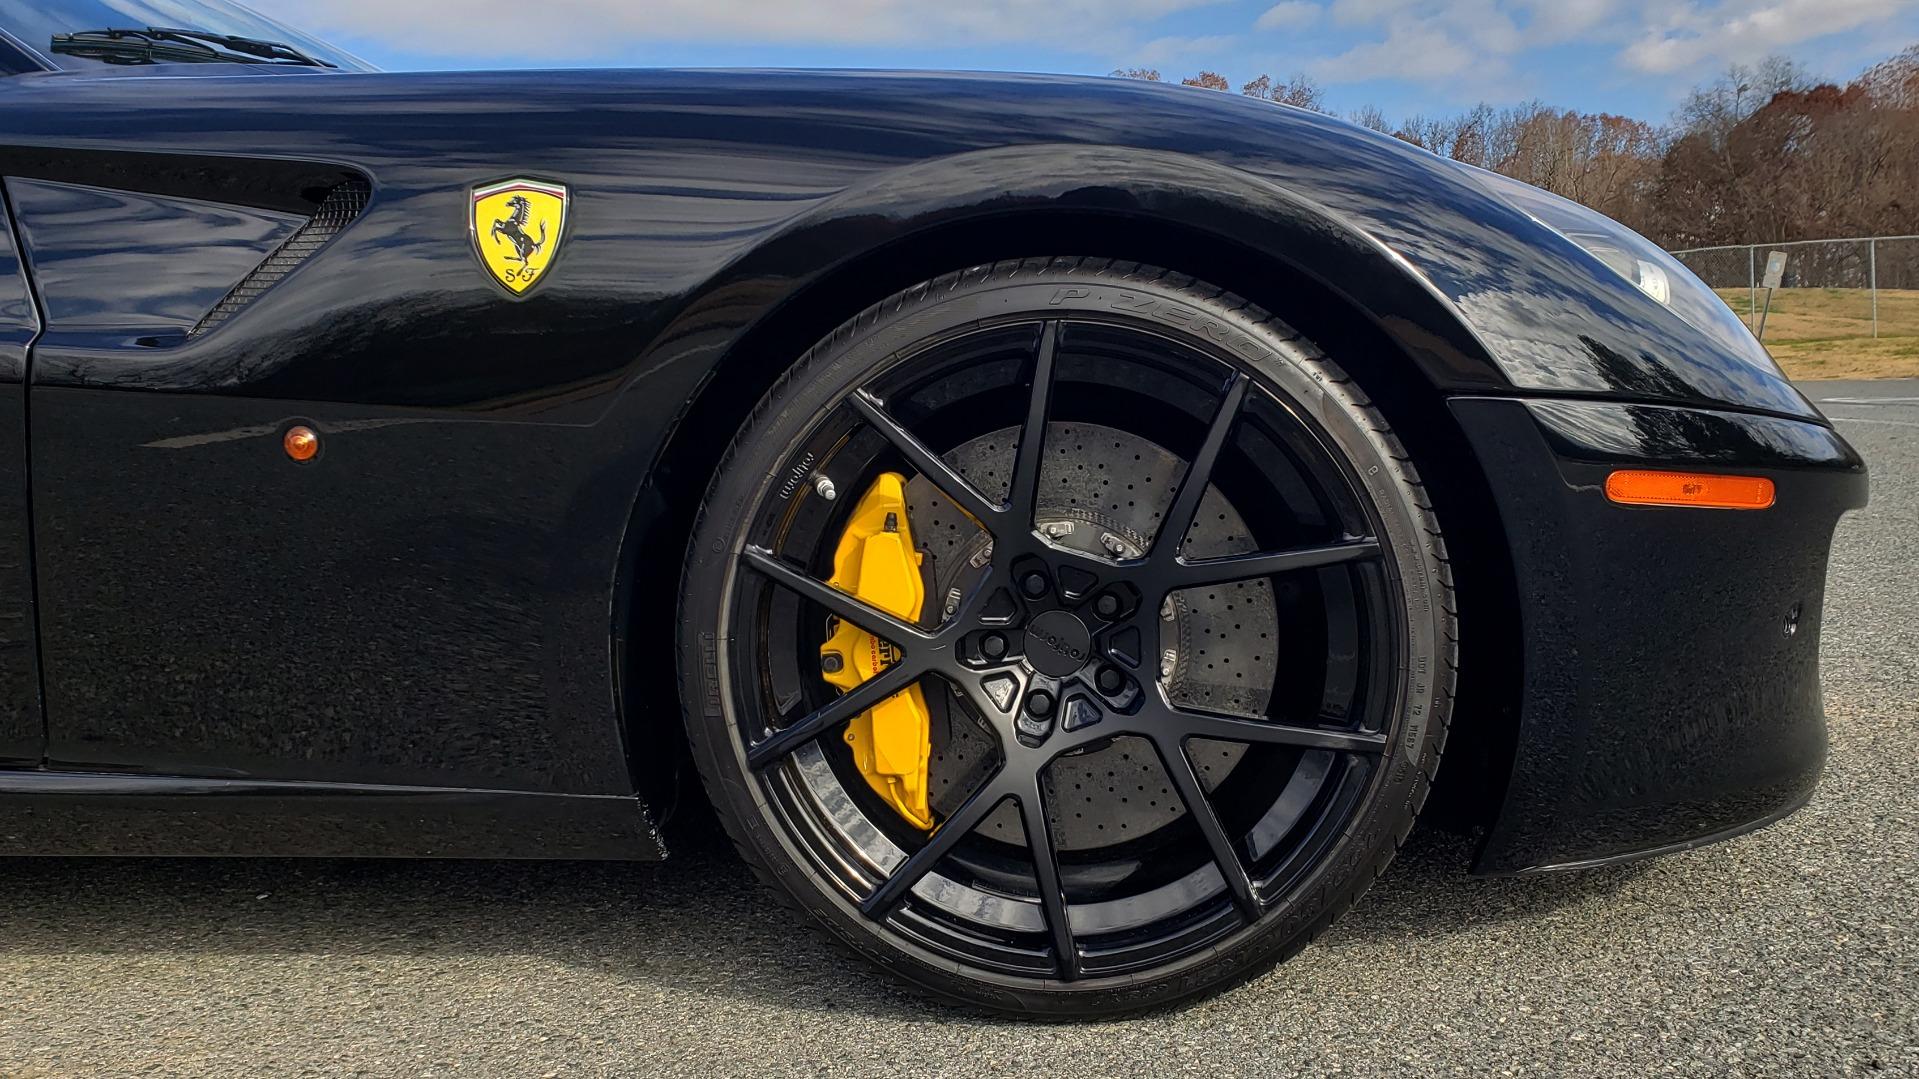 Used 2007 Ferrari 599 GTB FIORANO HGTE / V12 / F1 TRANS / NAV / BOSE / CUSTOM WHEELS for sale $109,999 at Formula Imports in Charlotte NC 28227 122